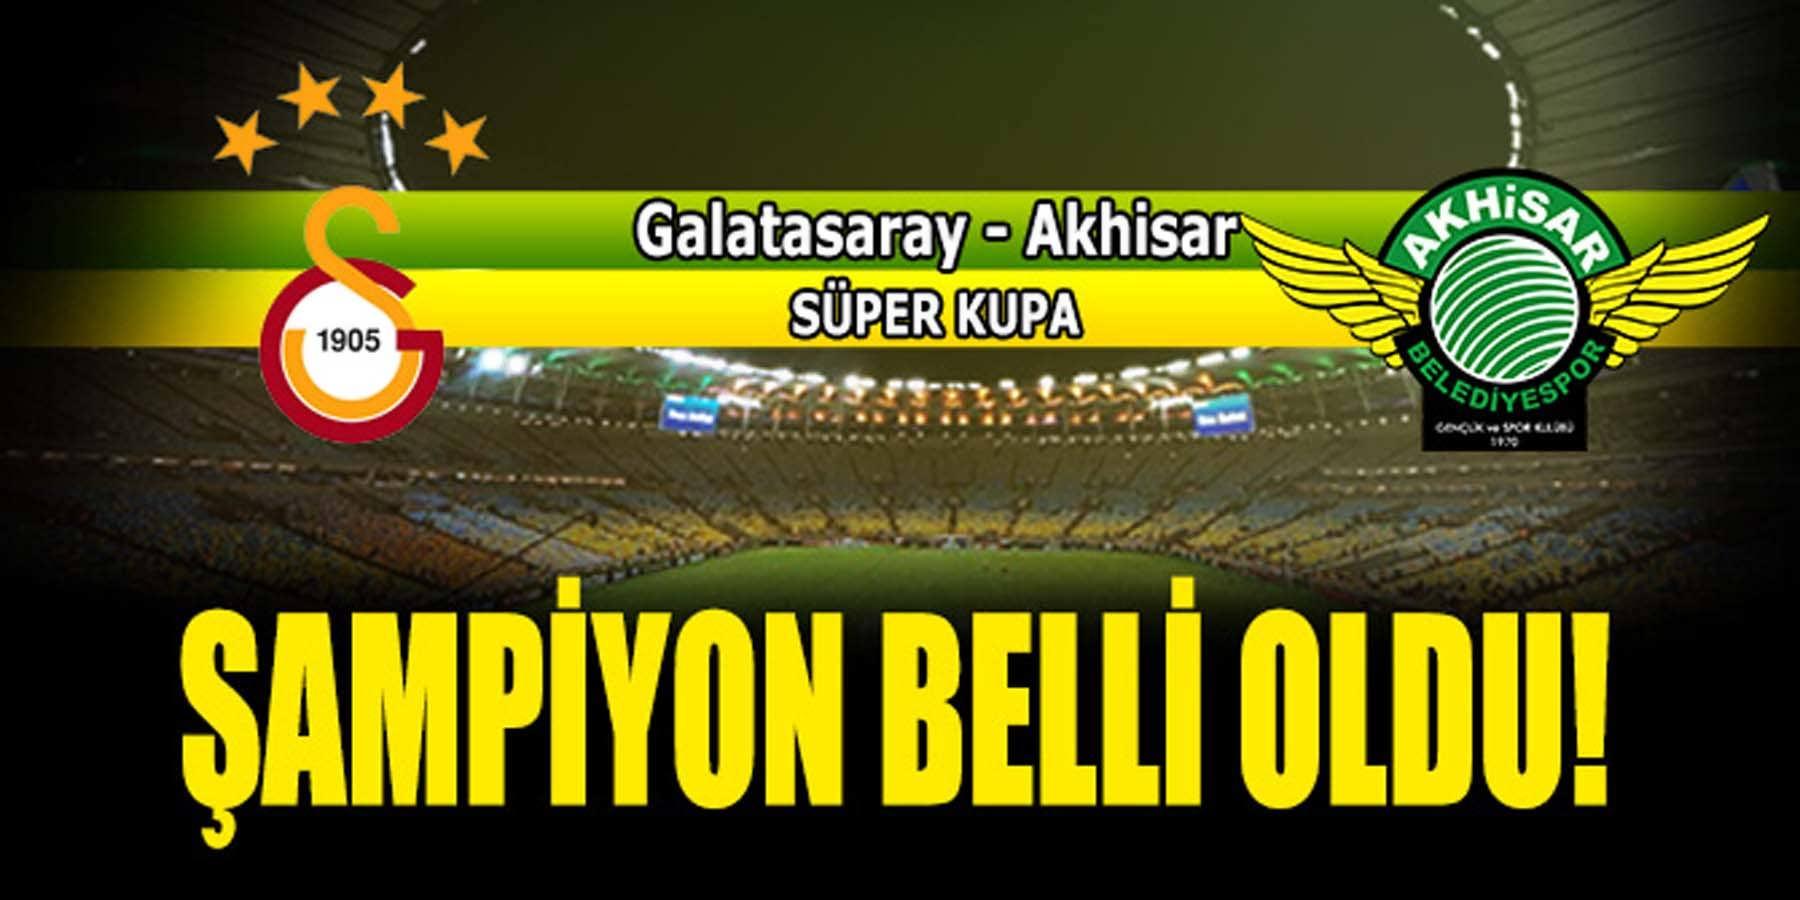 Galatasaray Akhisar Süper Kupa Şampiyonu Belli Oldu